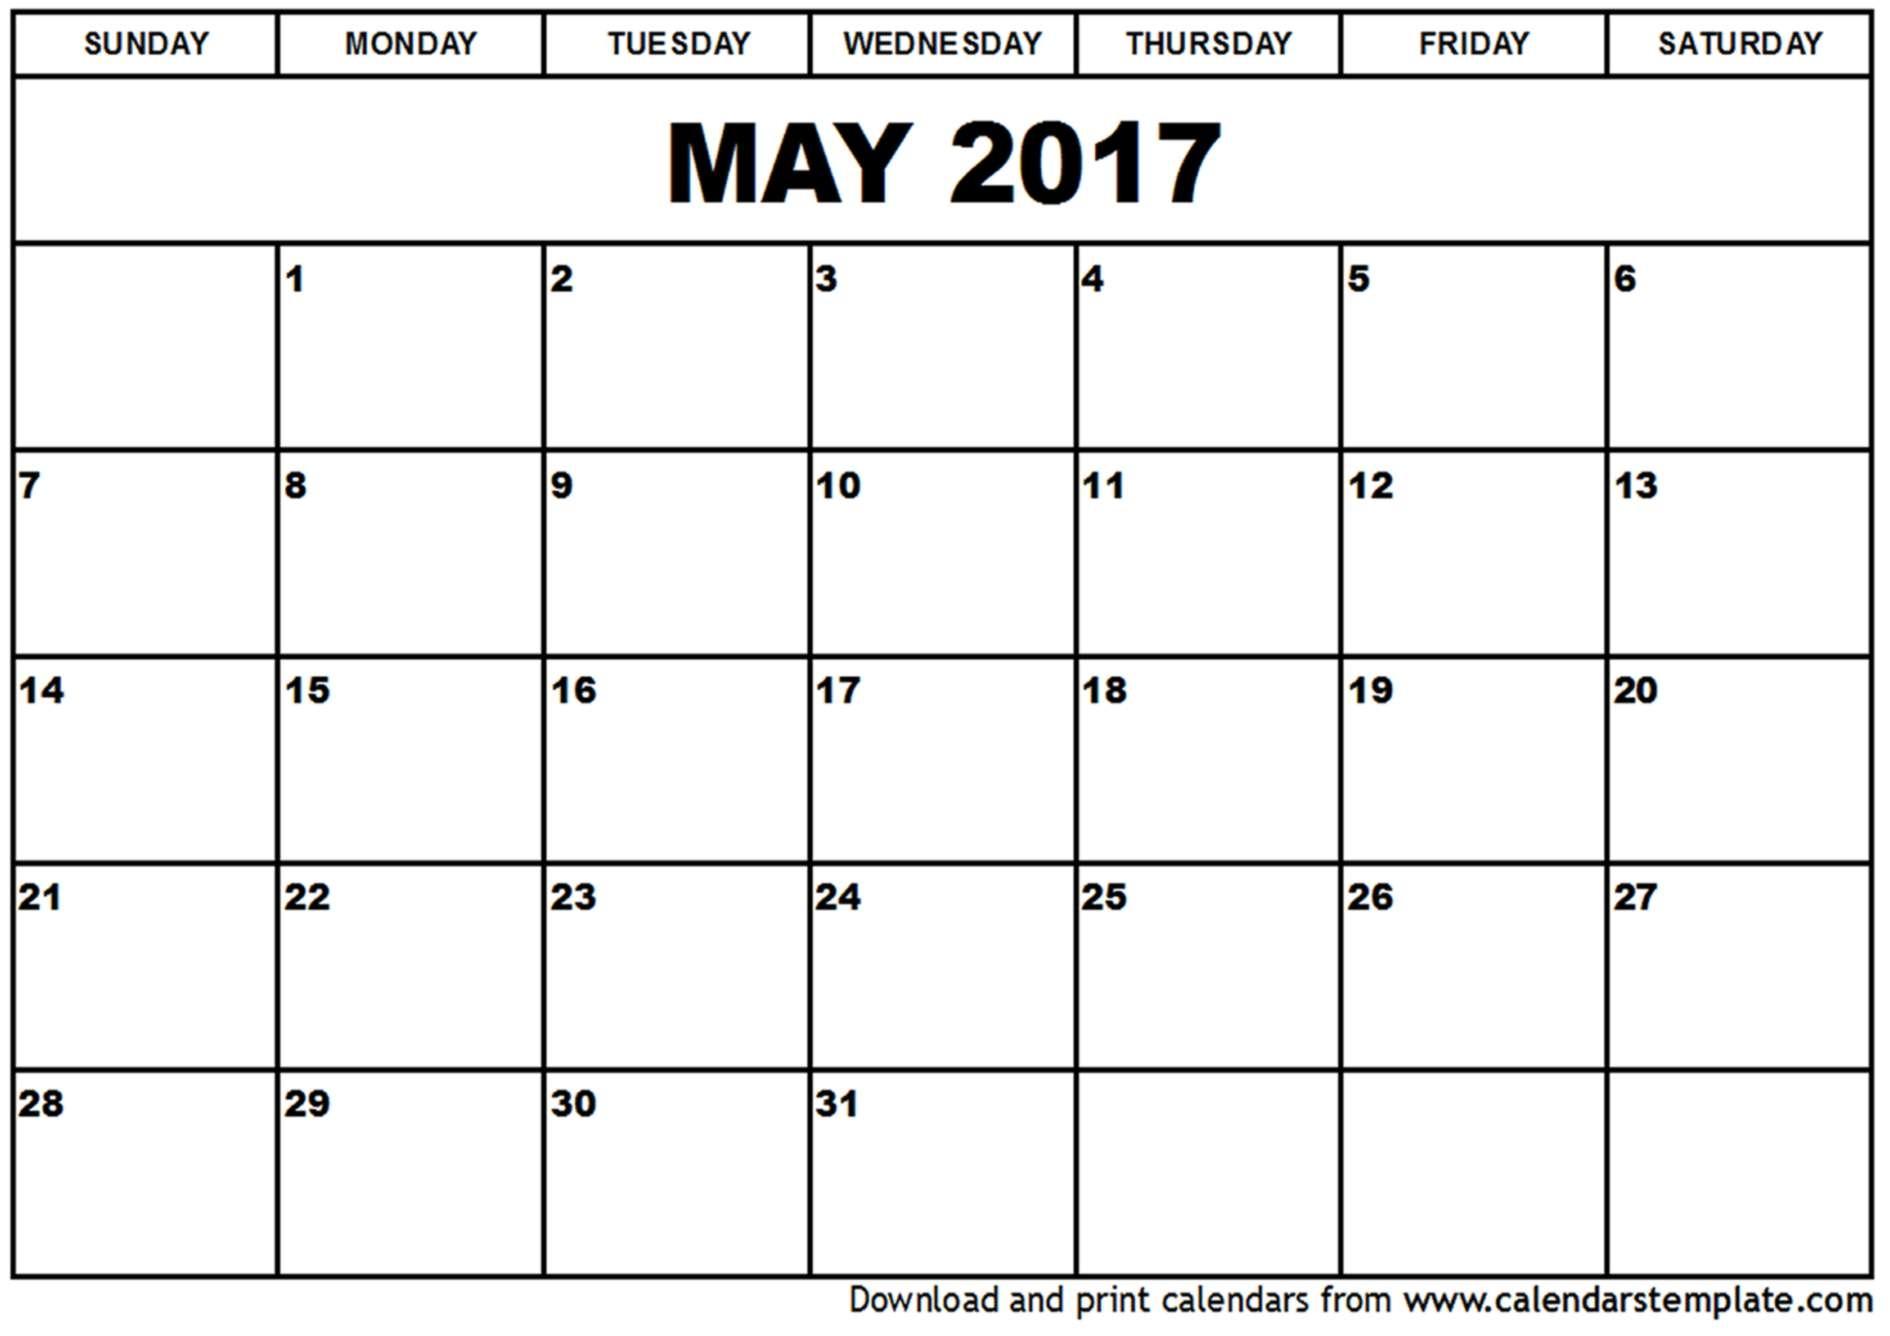 May 2017 Calendar Template Organization Ideas Pinterest  Xjb